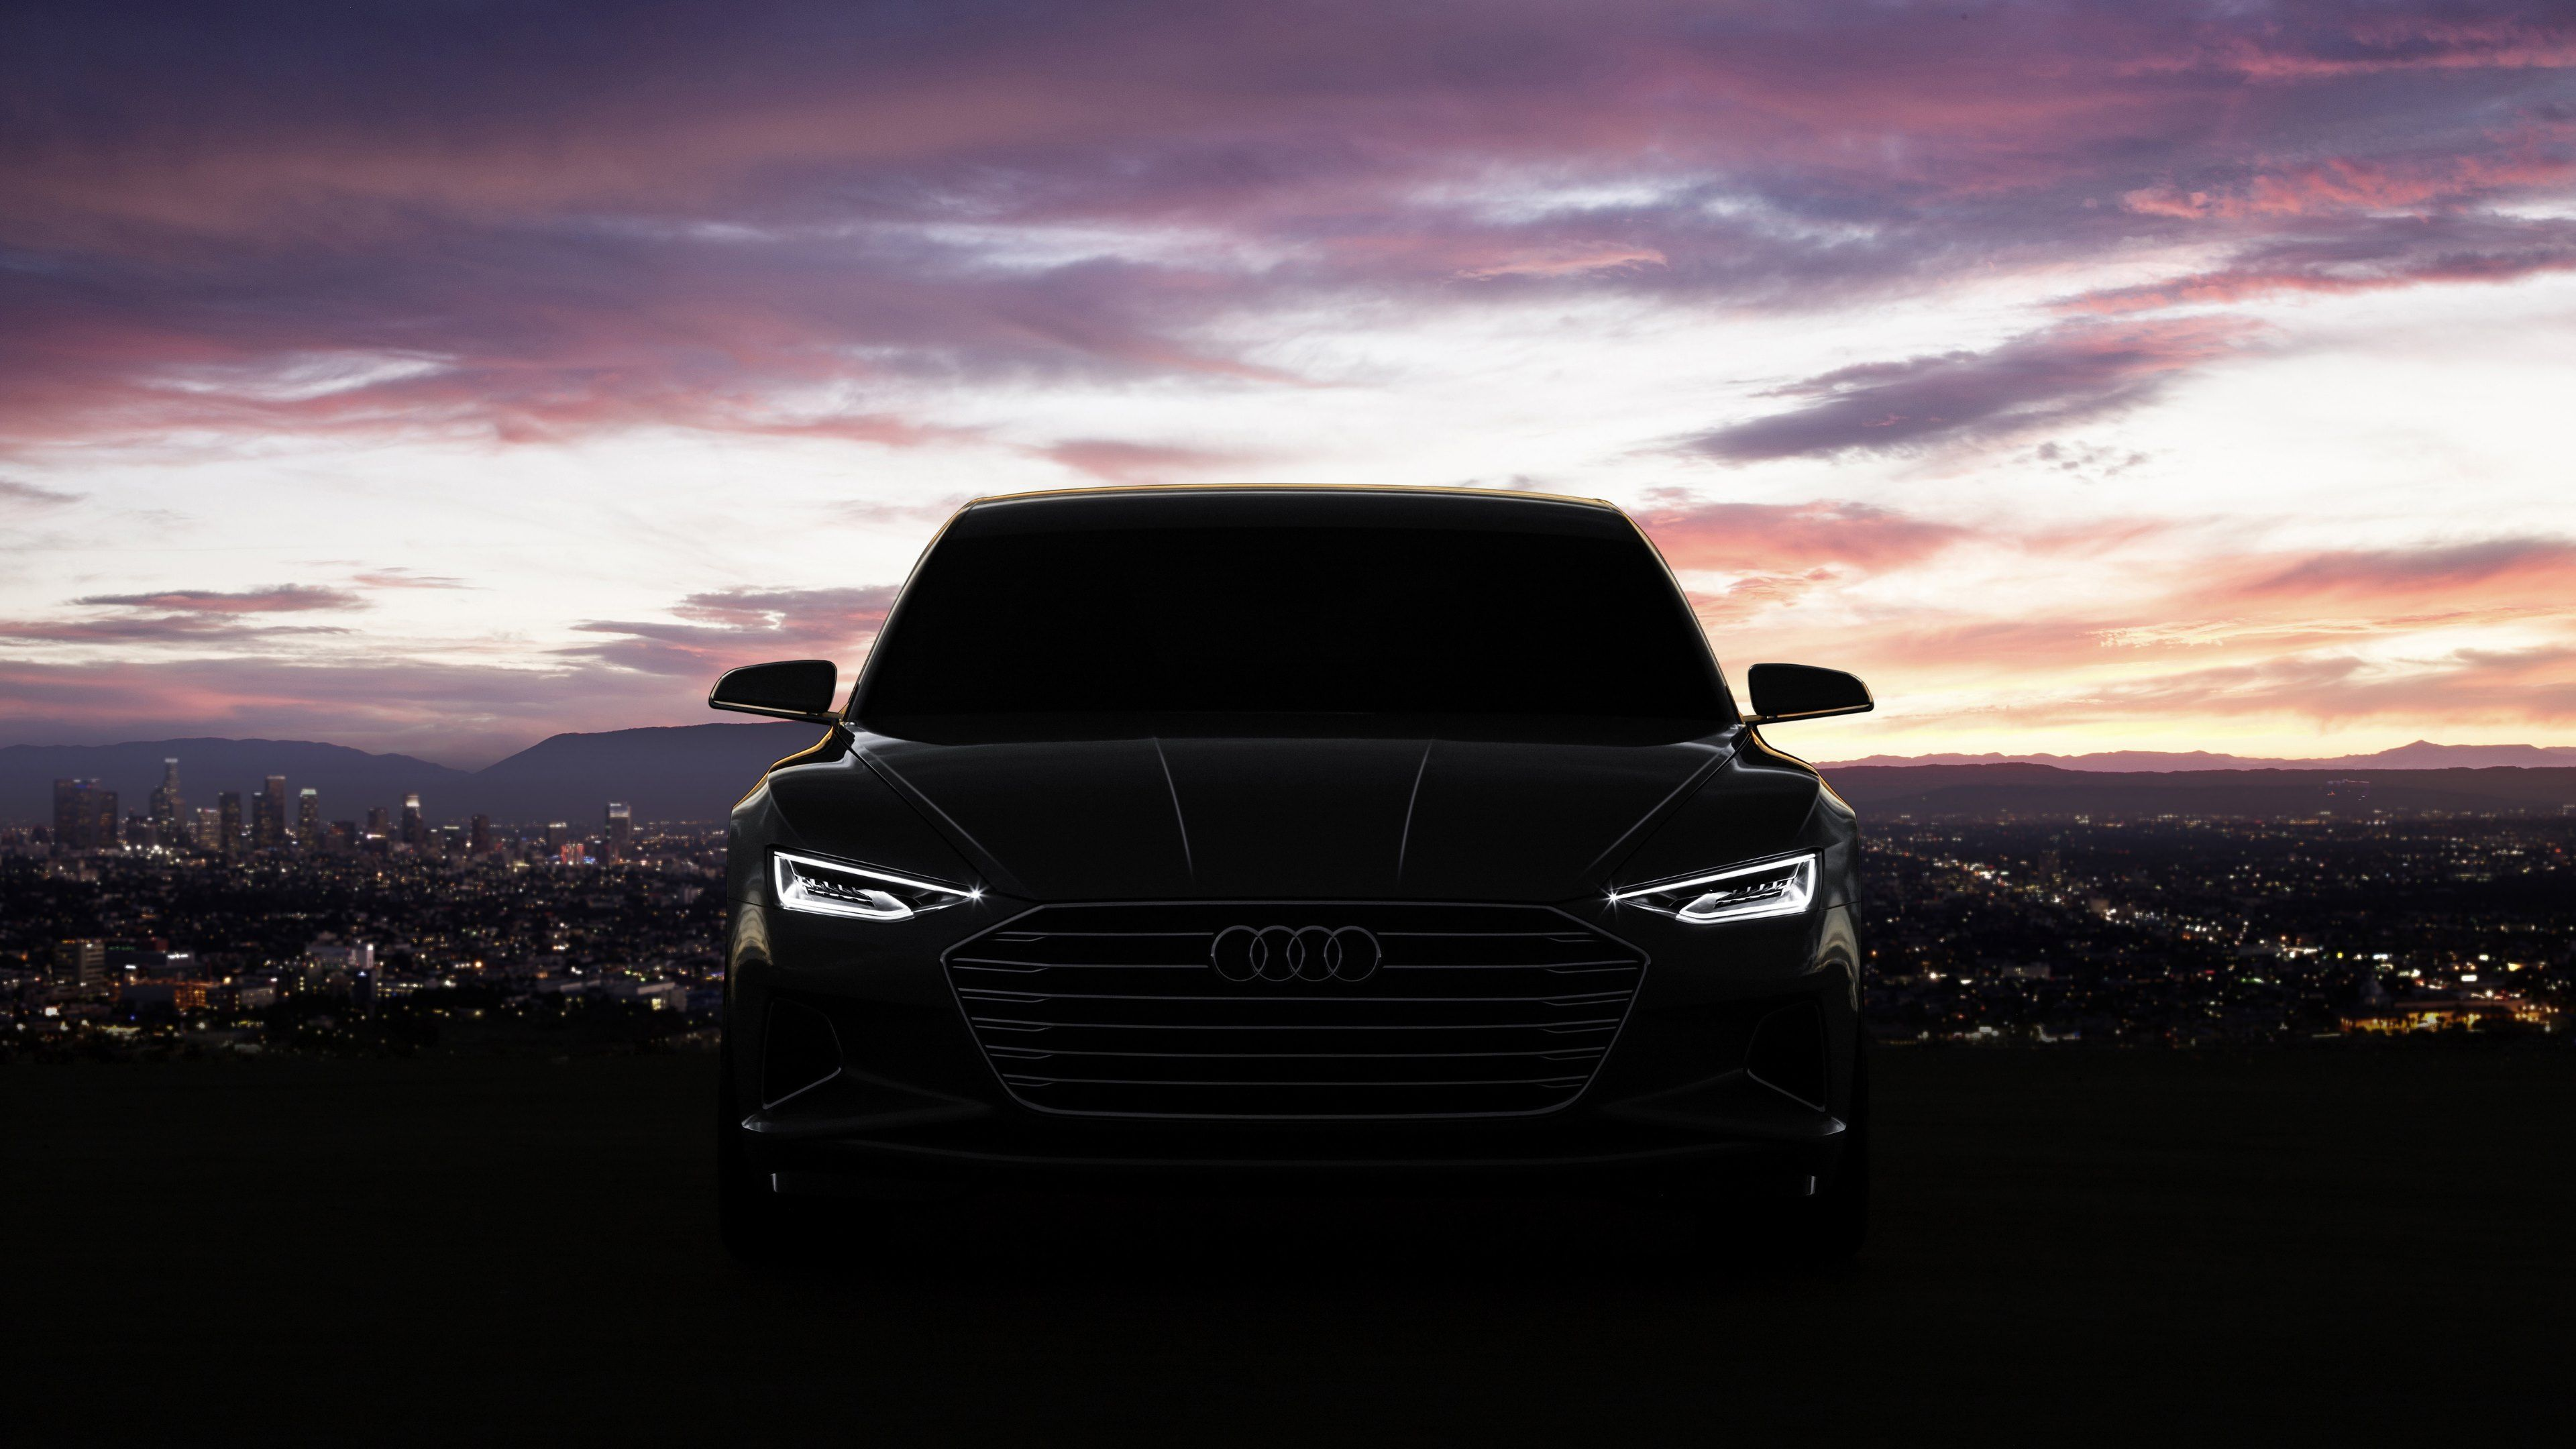 Audi 4k Wallpapers Top Free Audi 4k Backgrounds Wallpaperaccess Audi Audi Supercar Audi Q